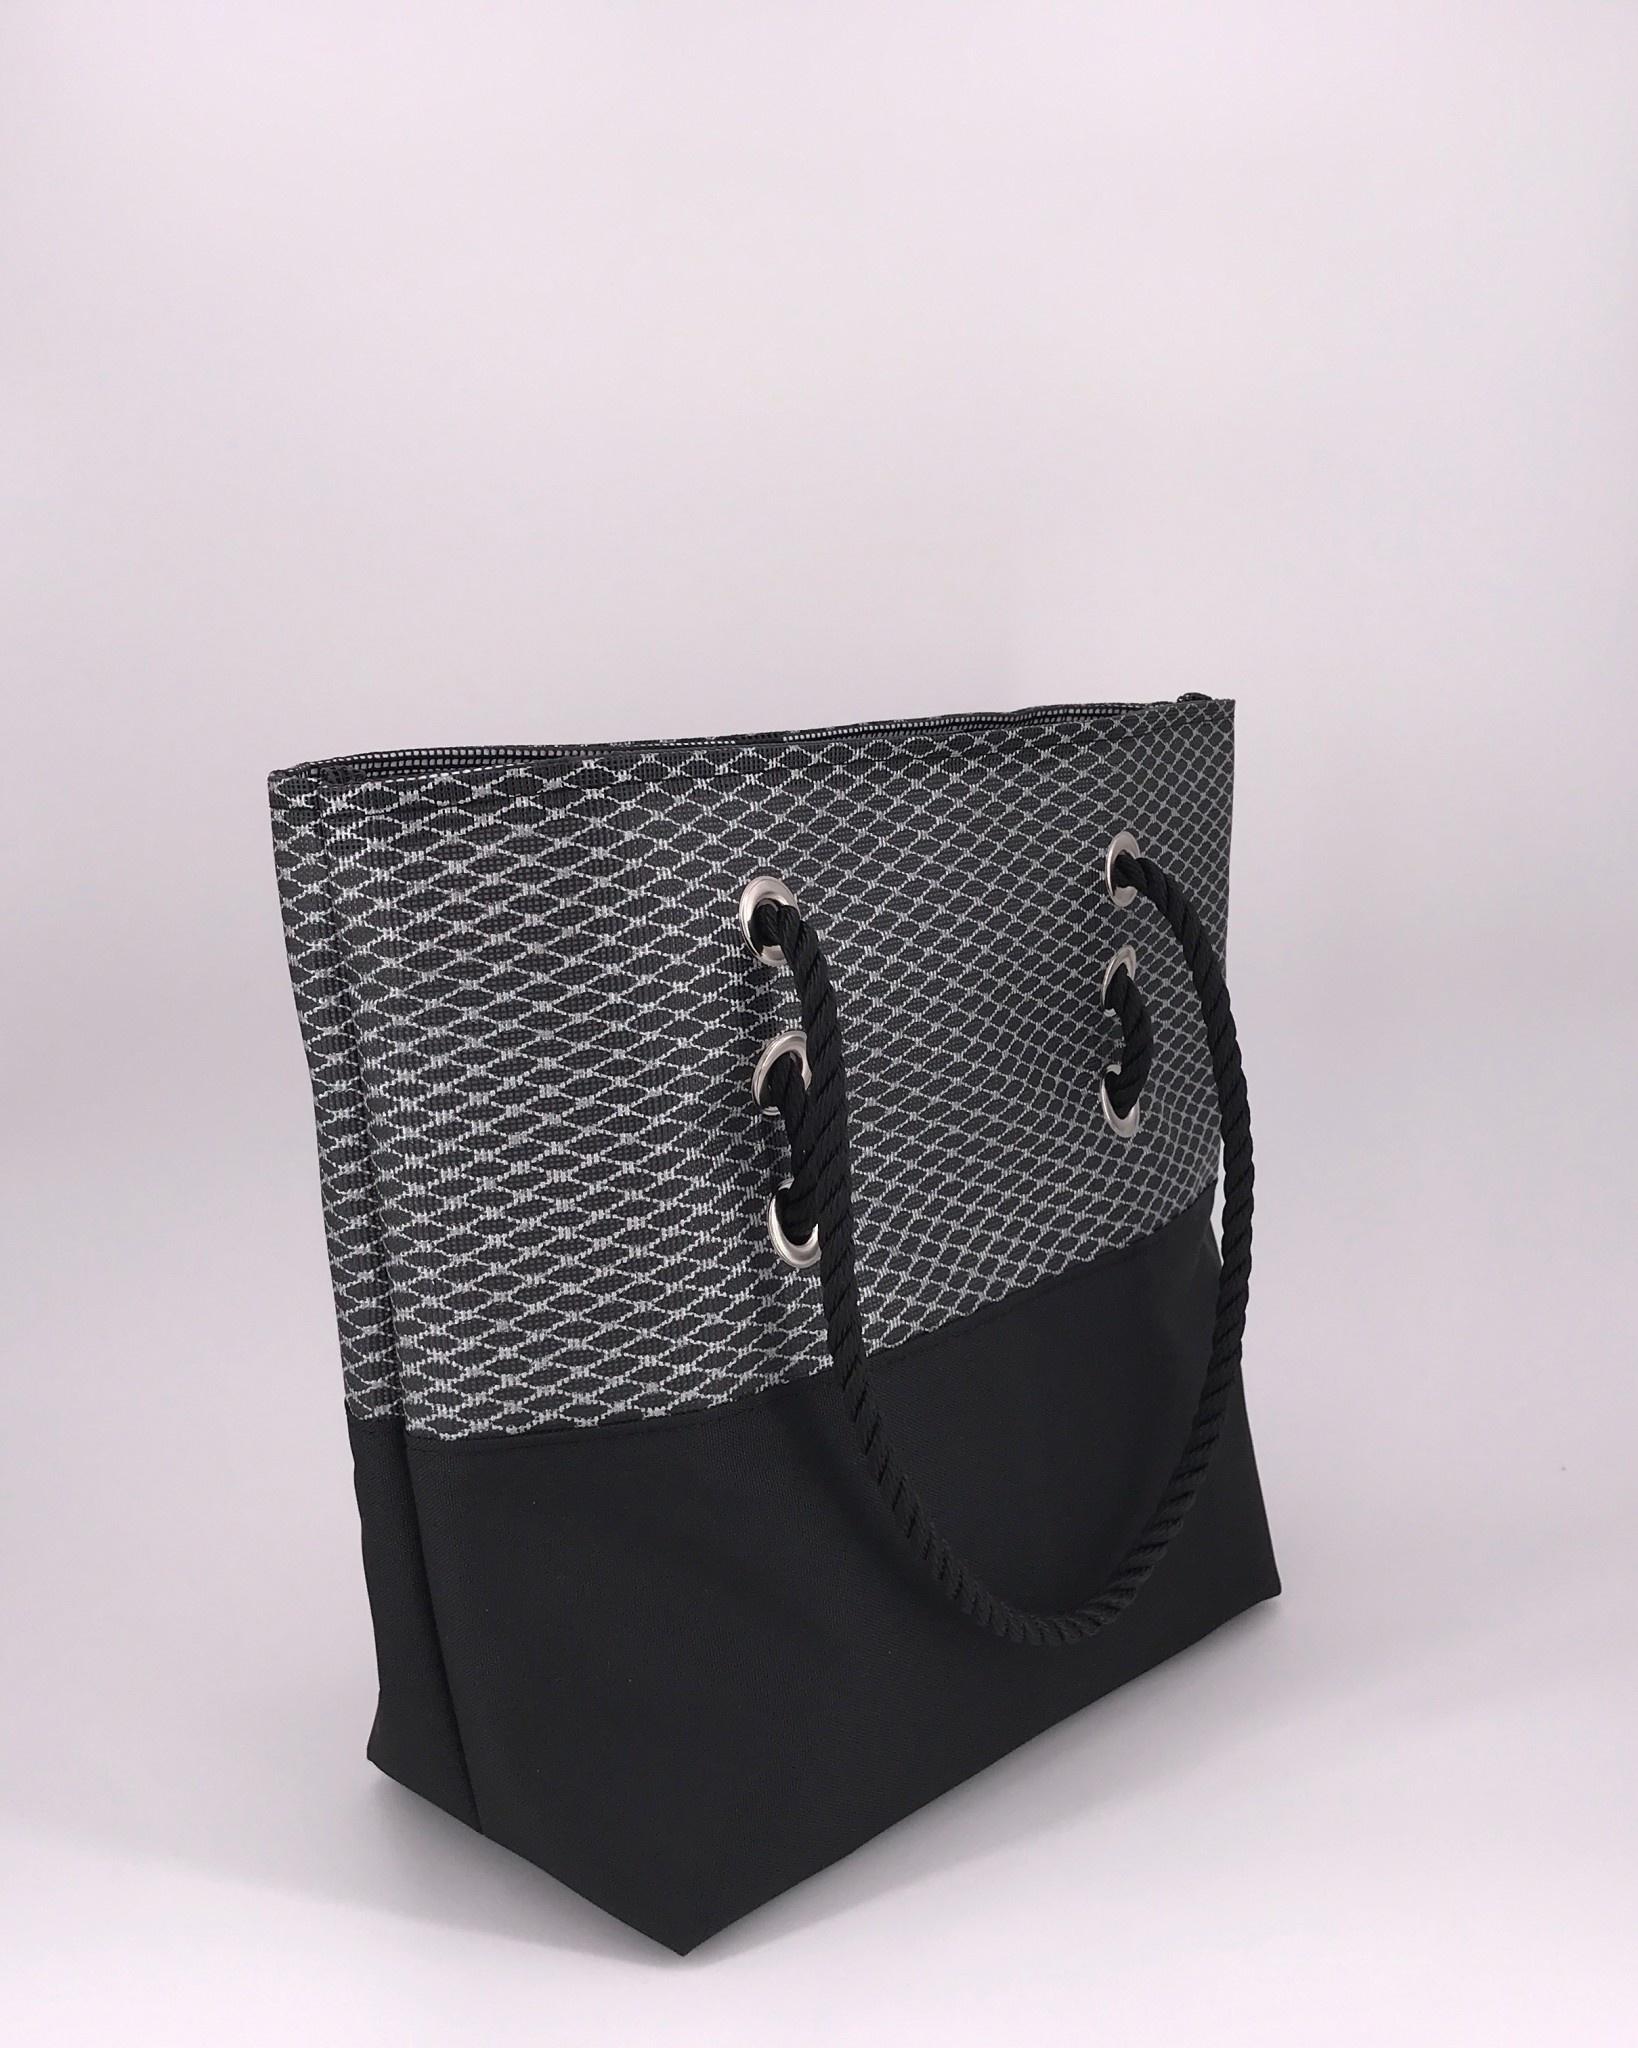 Alaina Marie ® Mini Silver Metallic on Black & Black Tote